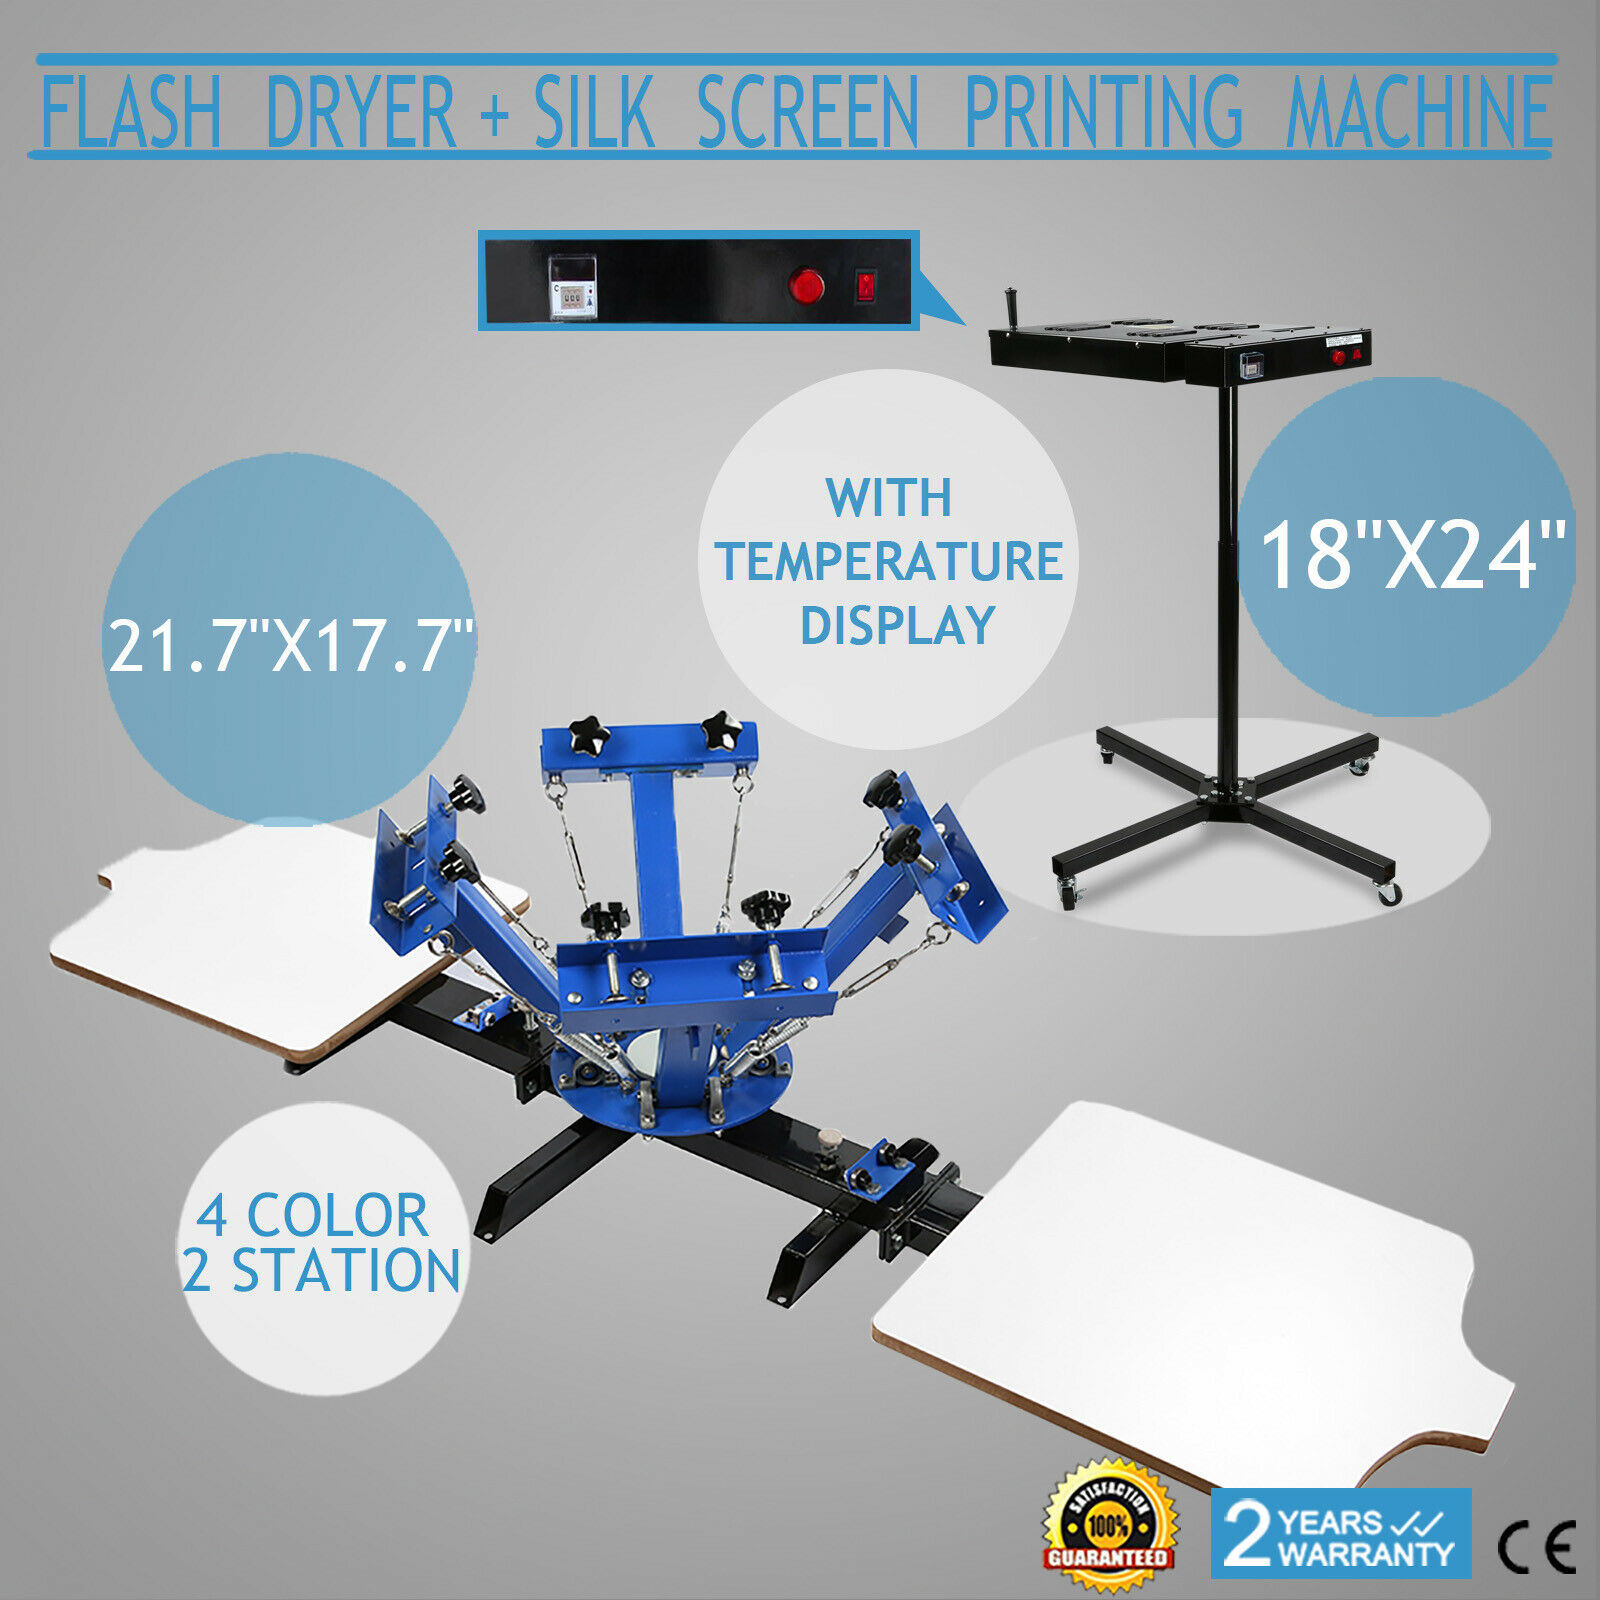 "4 Color Screen Printing 2 Station Kit 18/"" x 24/"" Flash Dryer Wood Pressing Press"